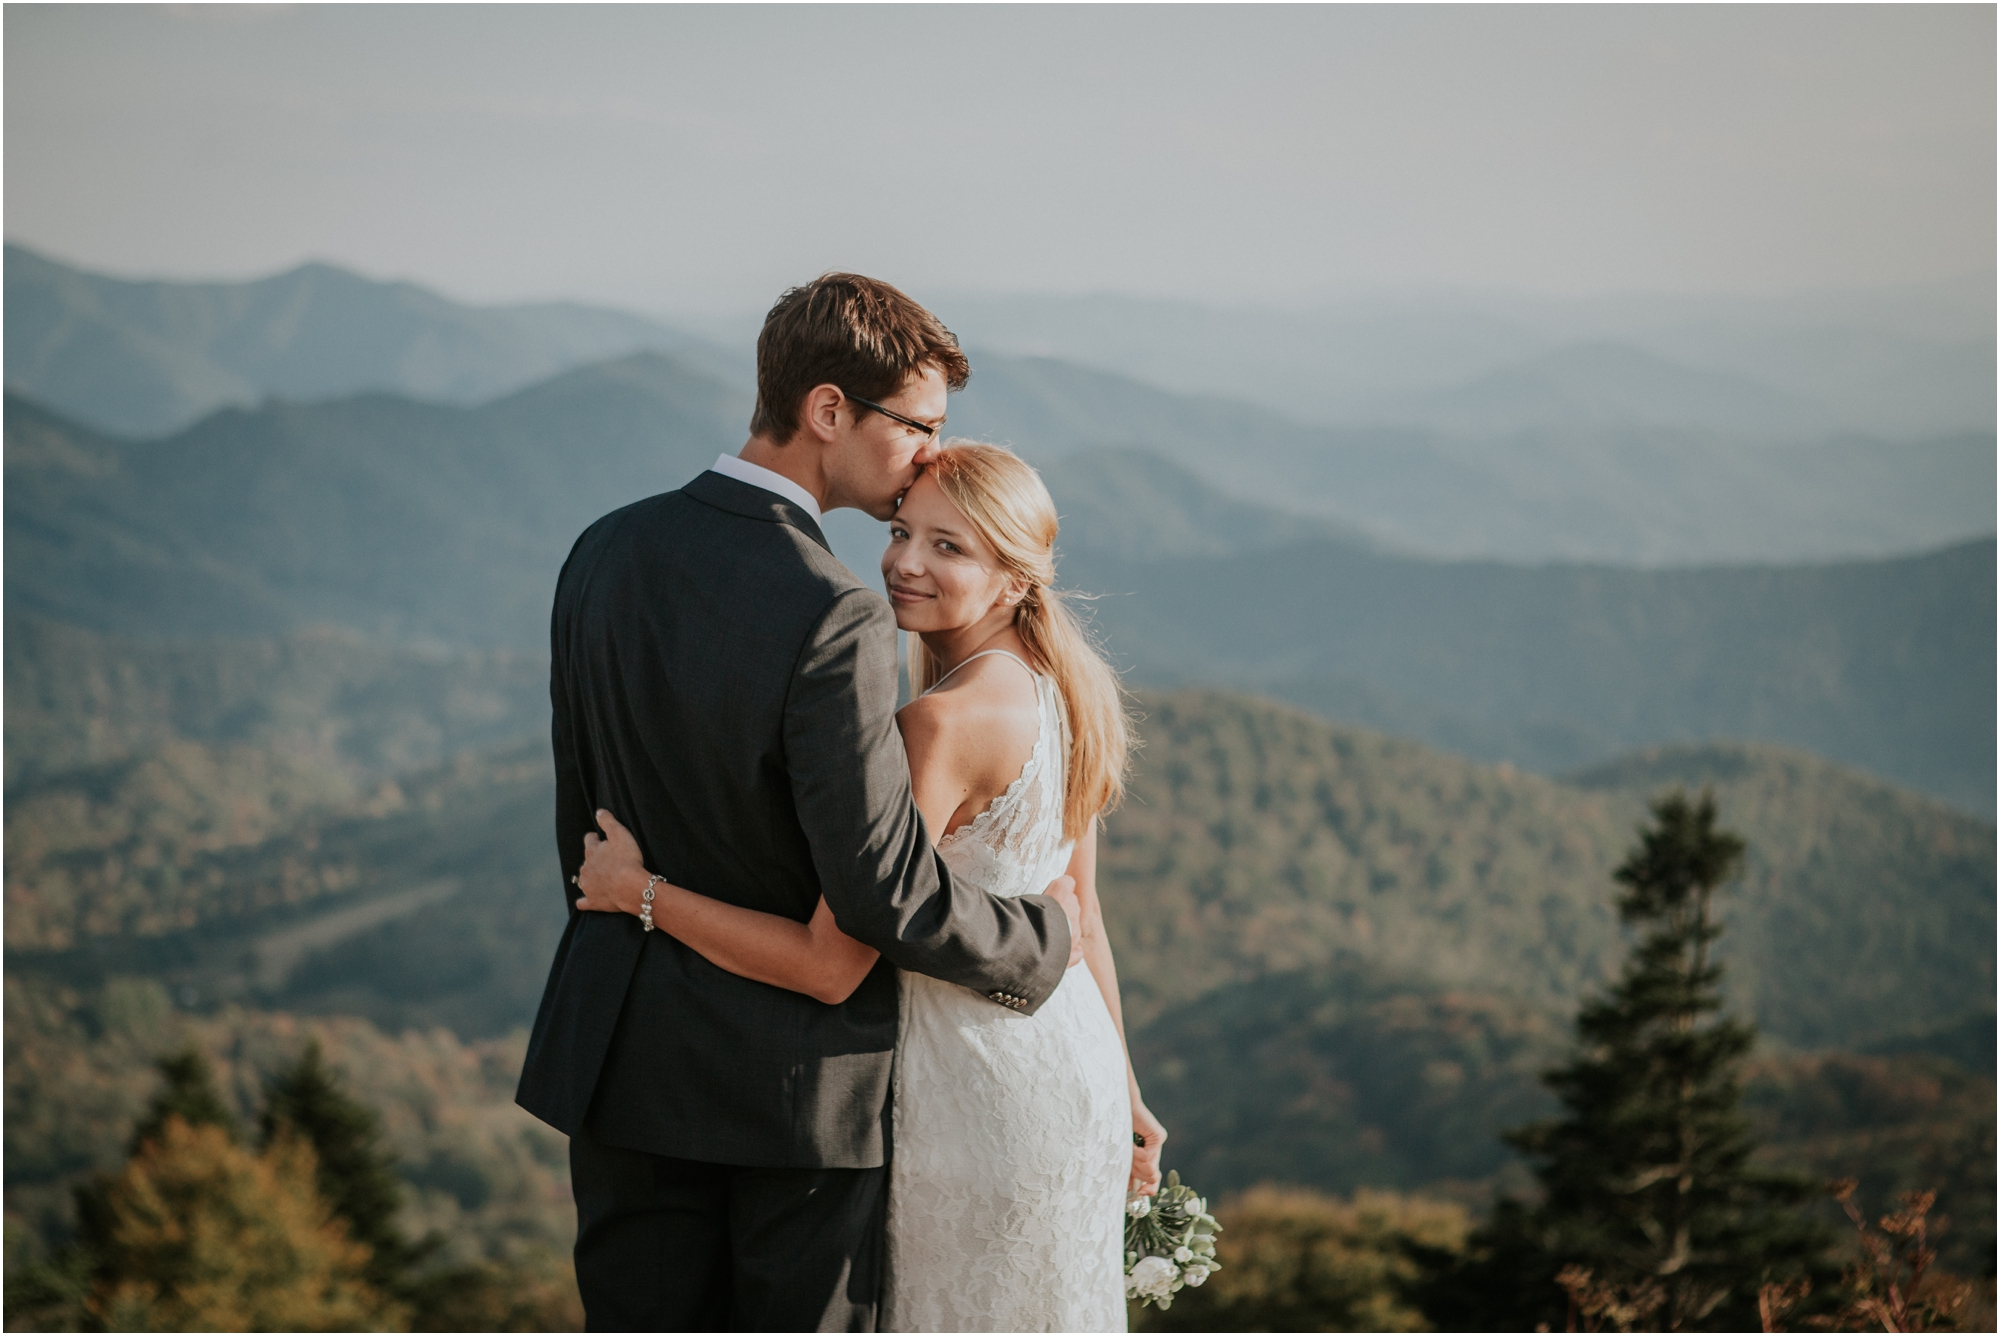 roan-mountain-tn-katy-sergent-photography-tennessee-elopement-intimate-wedding-adventurous-photographer-hiking-outdoors-summer-northeast-northcarolina-blue-ridge_0064.jpg